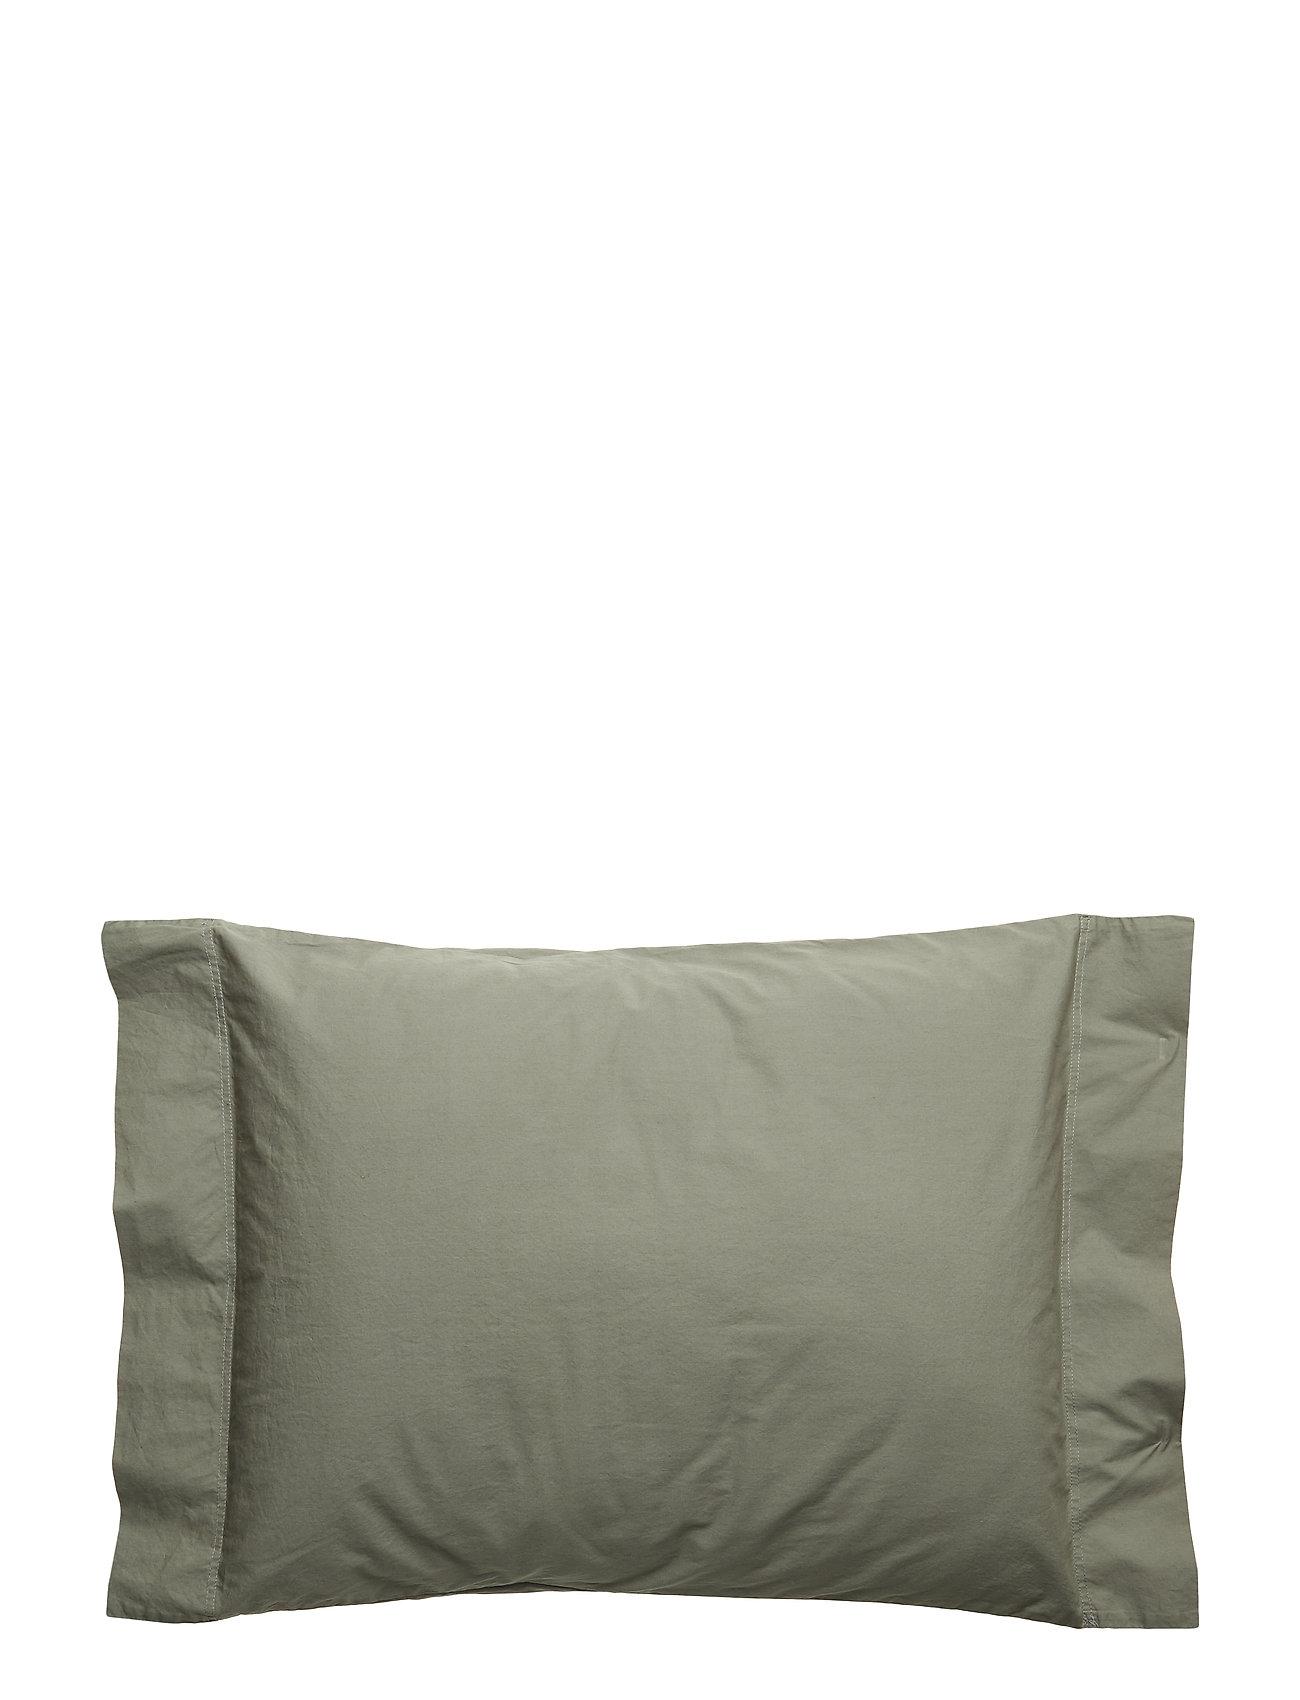 Linen Triple Pillow X Head CaseagaveDirty vn0ymwON8